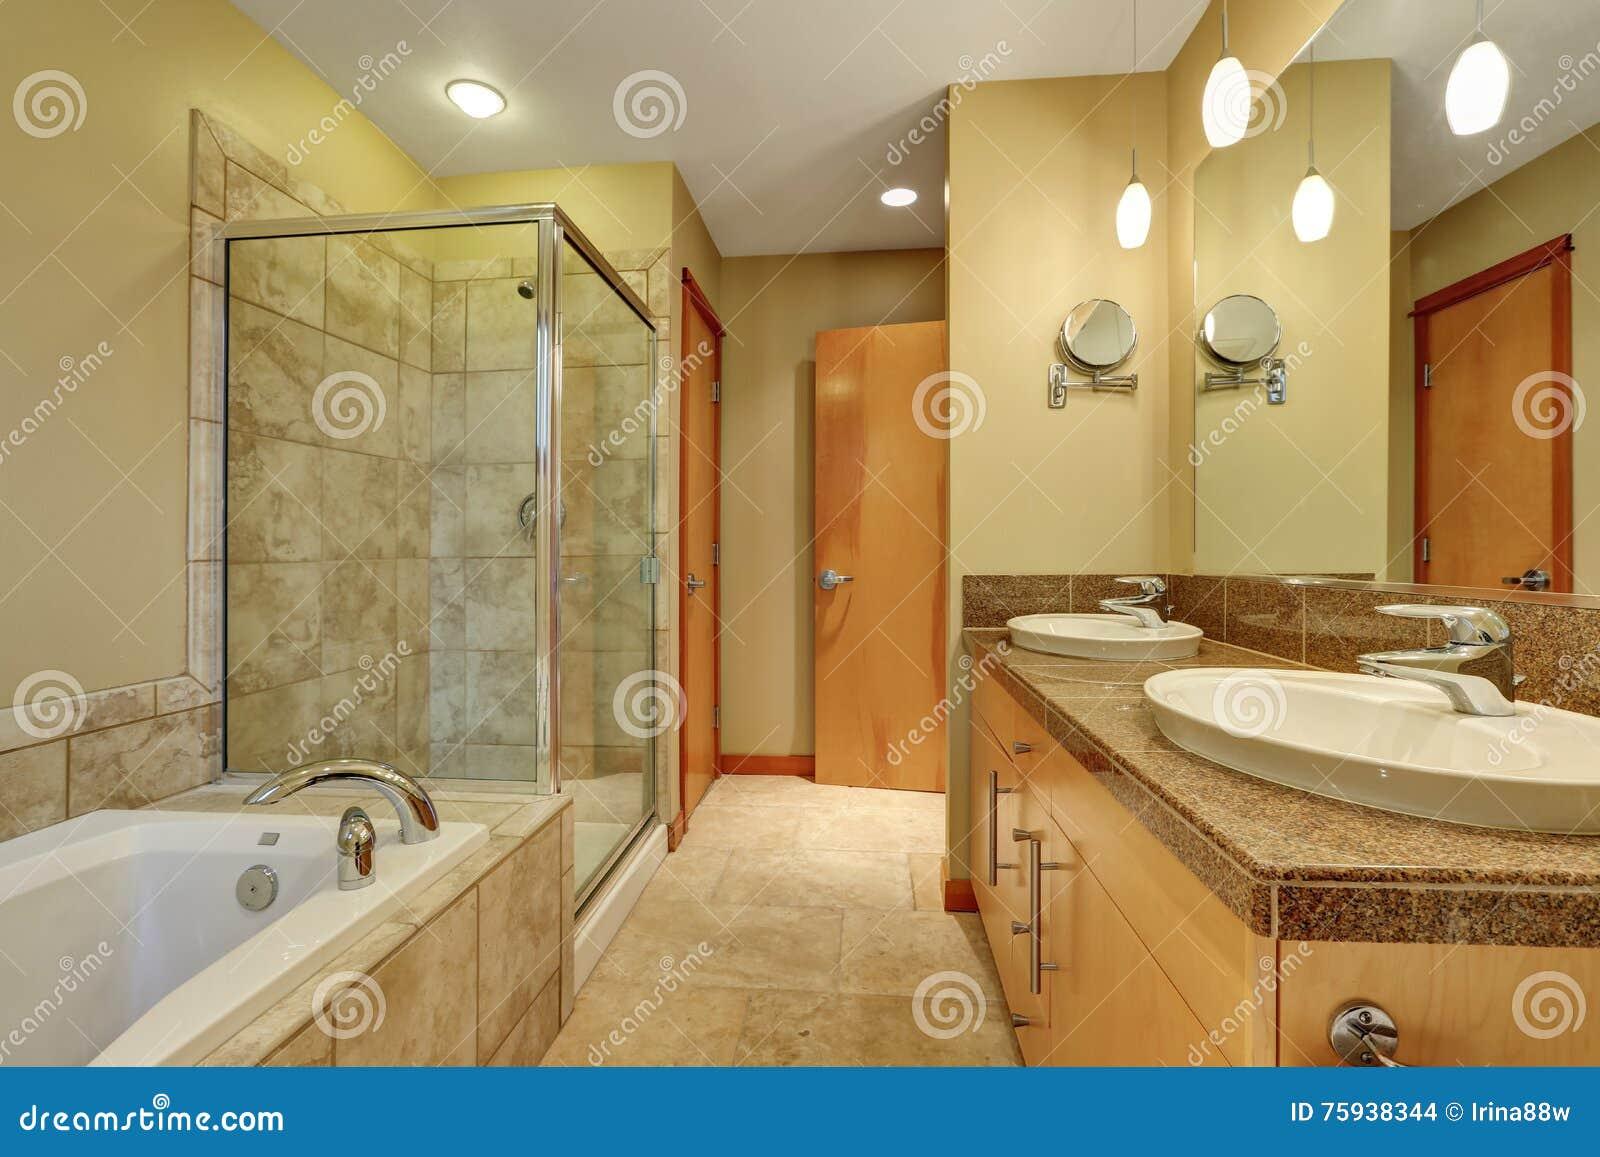 Bathroom Interior In Beige Tones With Vanity Cabinet With Granite ...